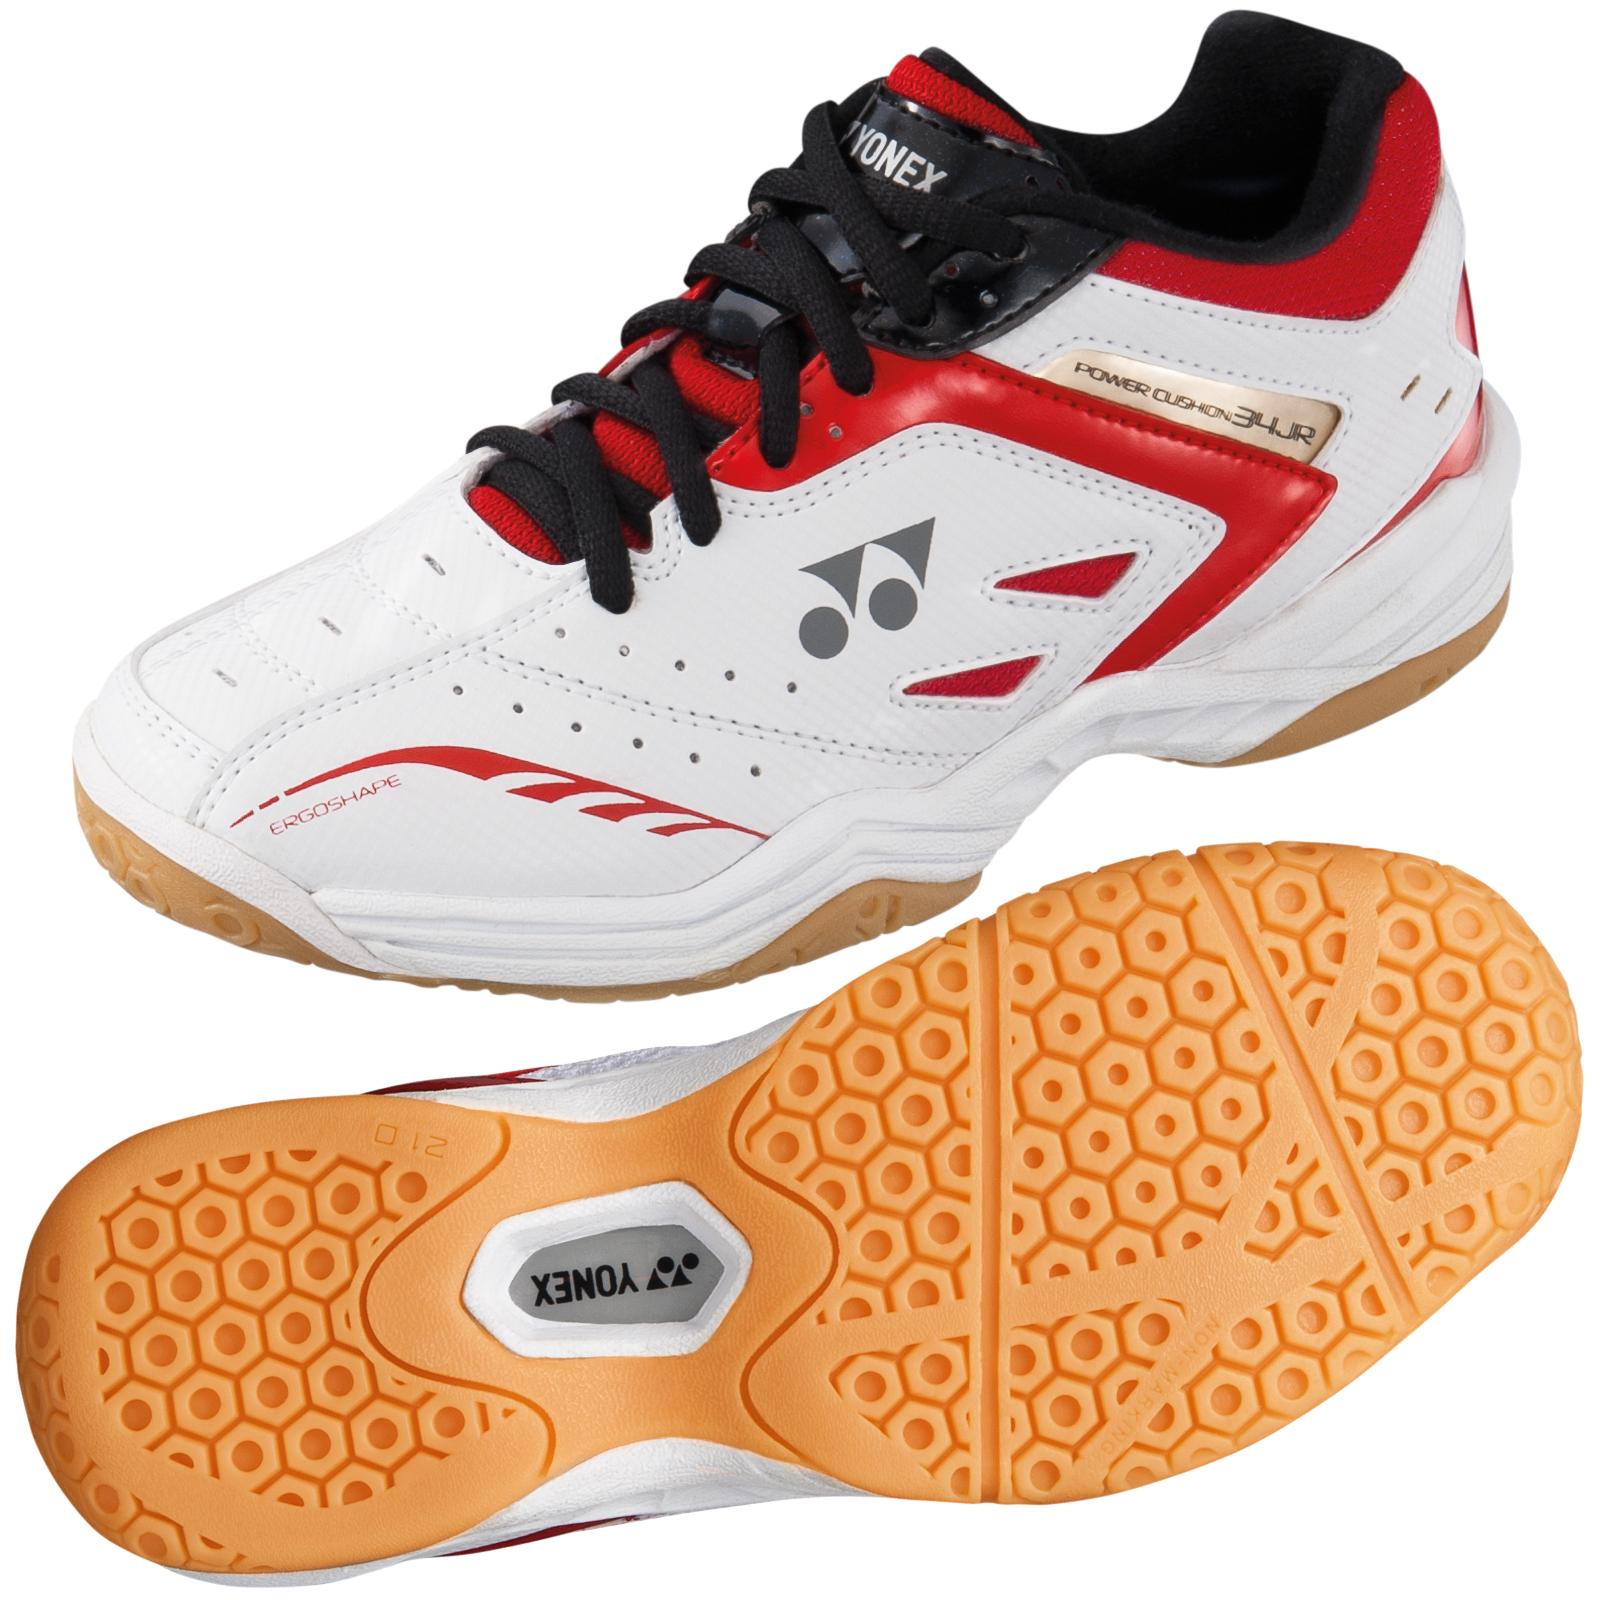 Yonex Power Cushion 34 Junior Badminton Shoes  1 UK